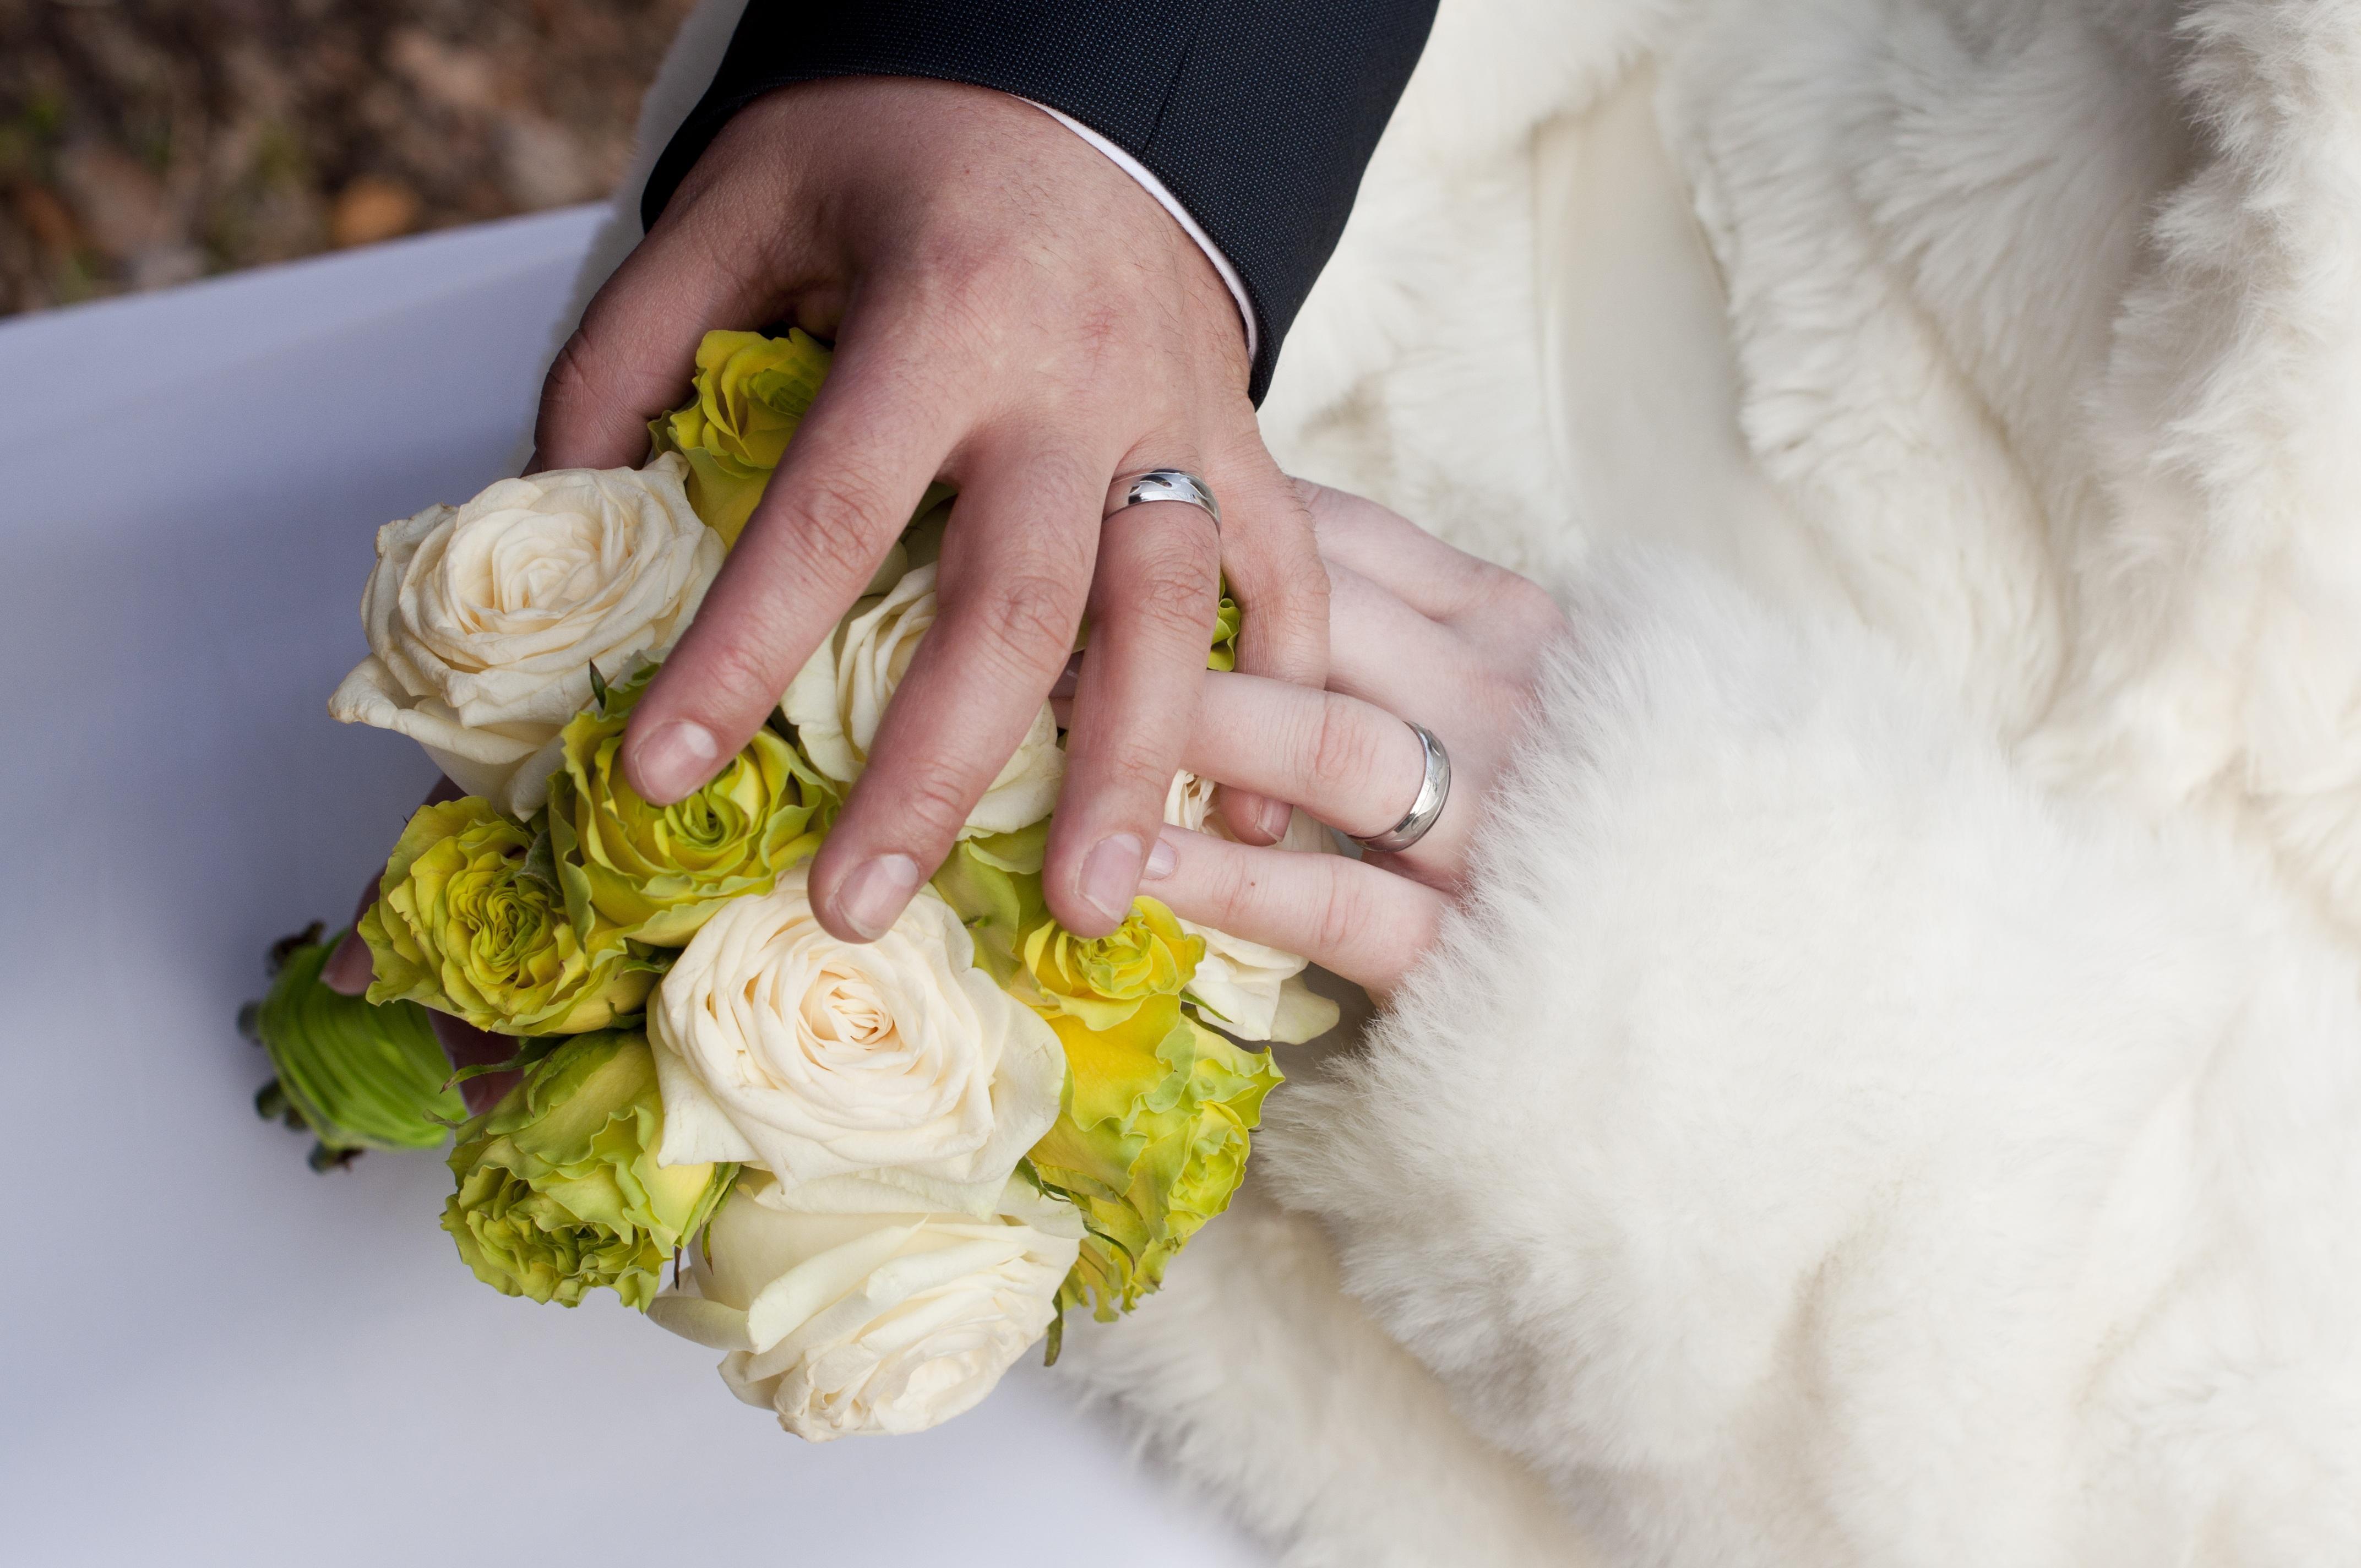 Free Images : man, girl, woman, petal, couple, yellow, wedding dress ...